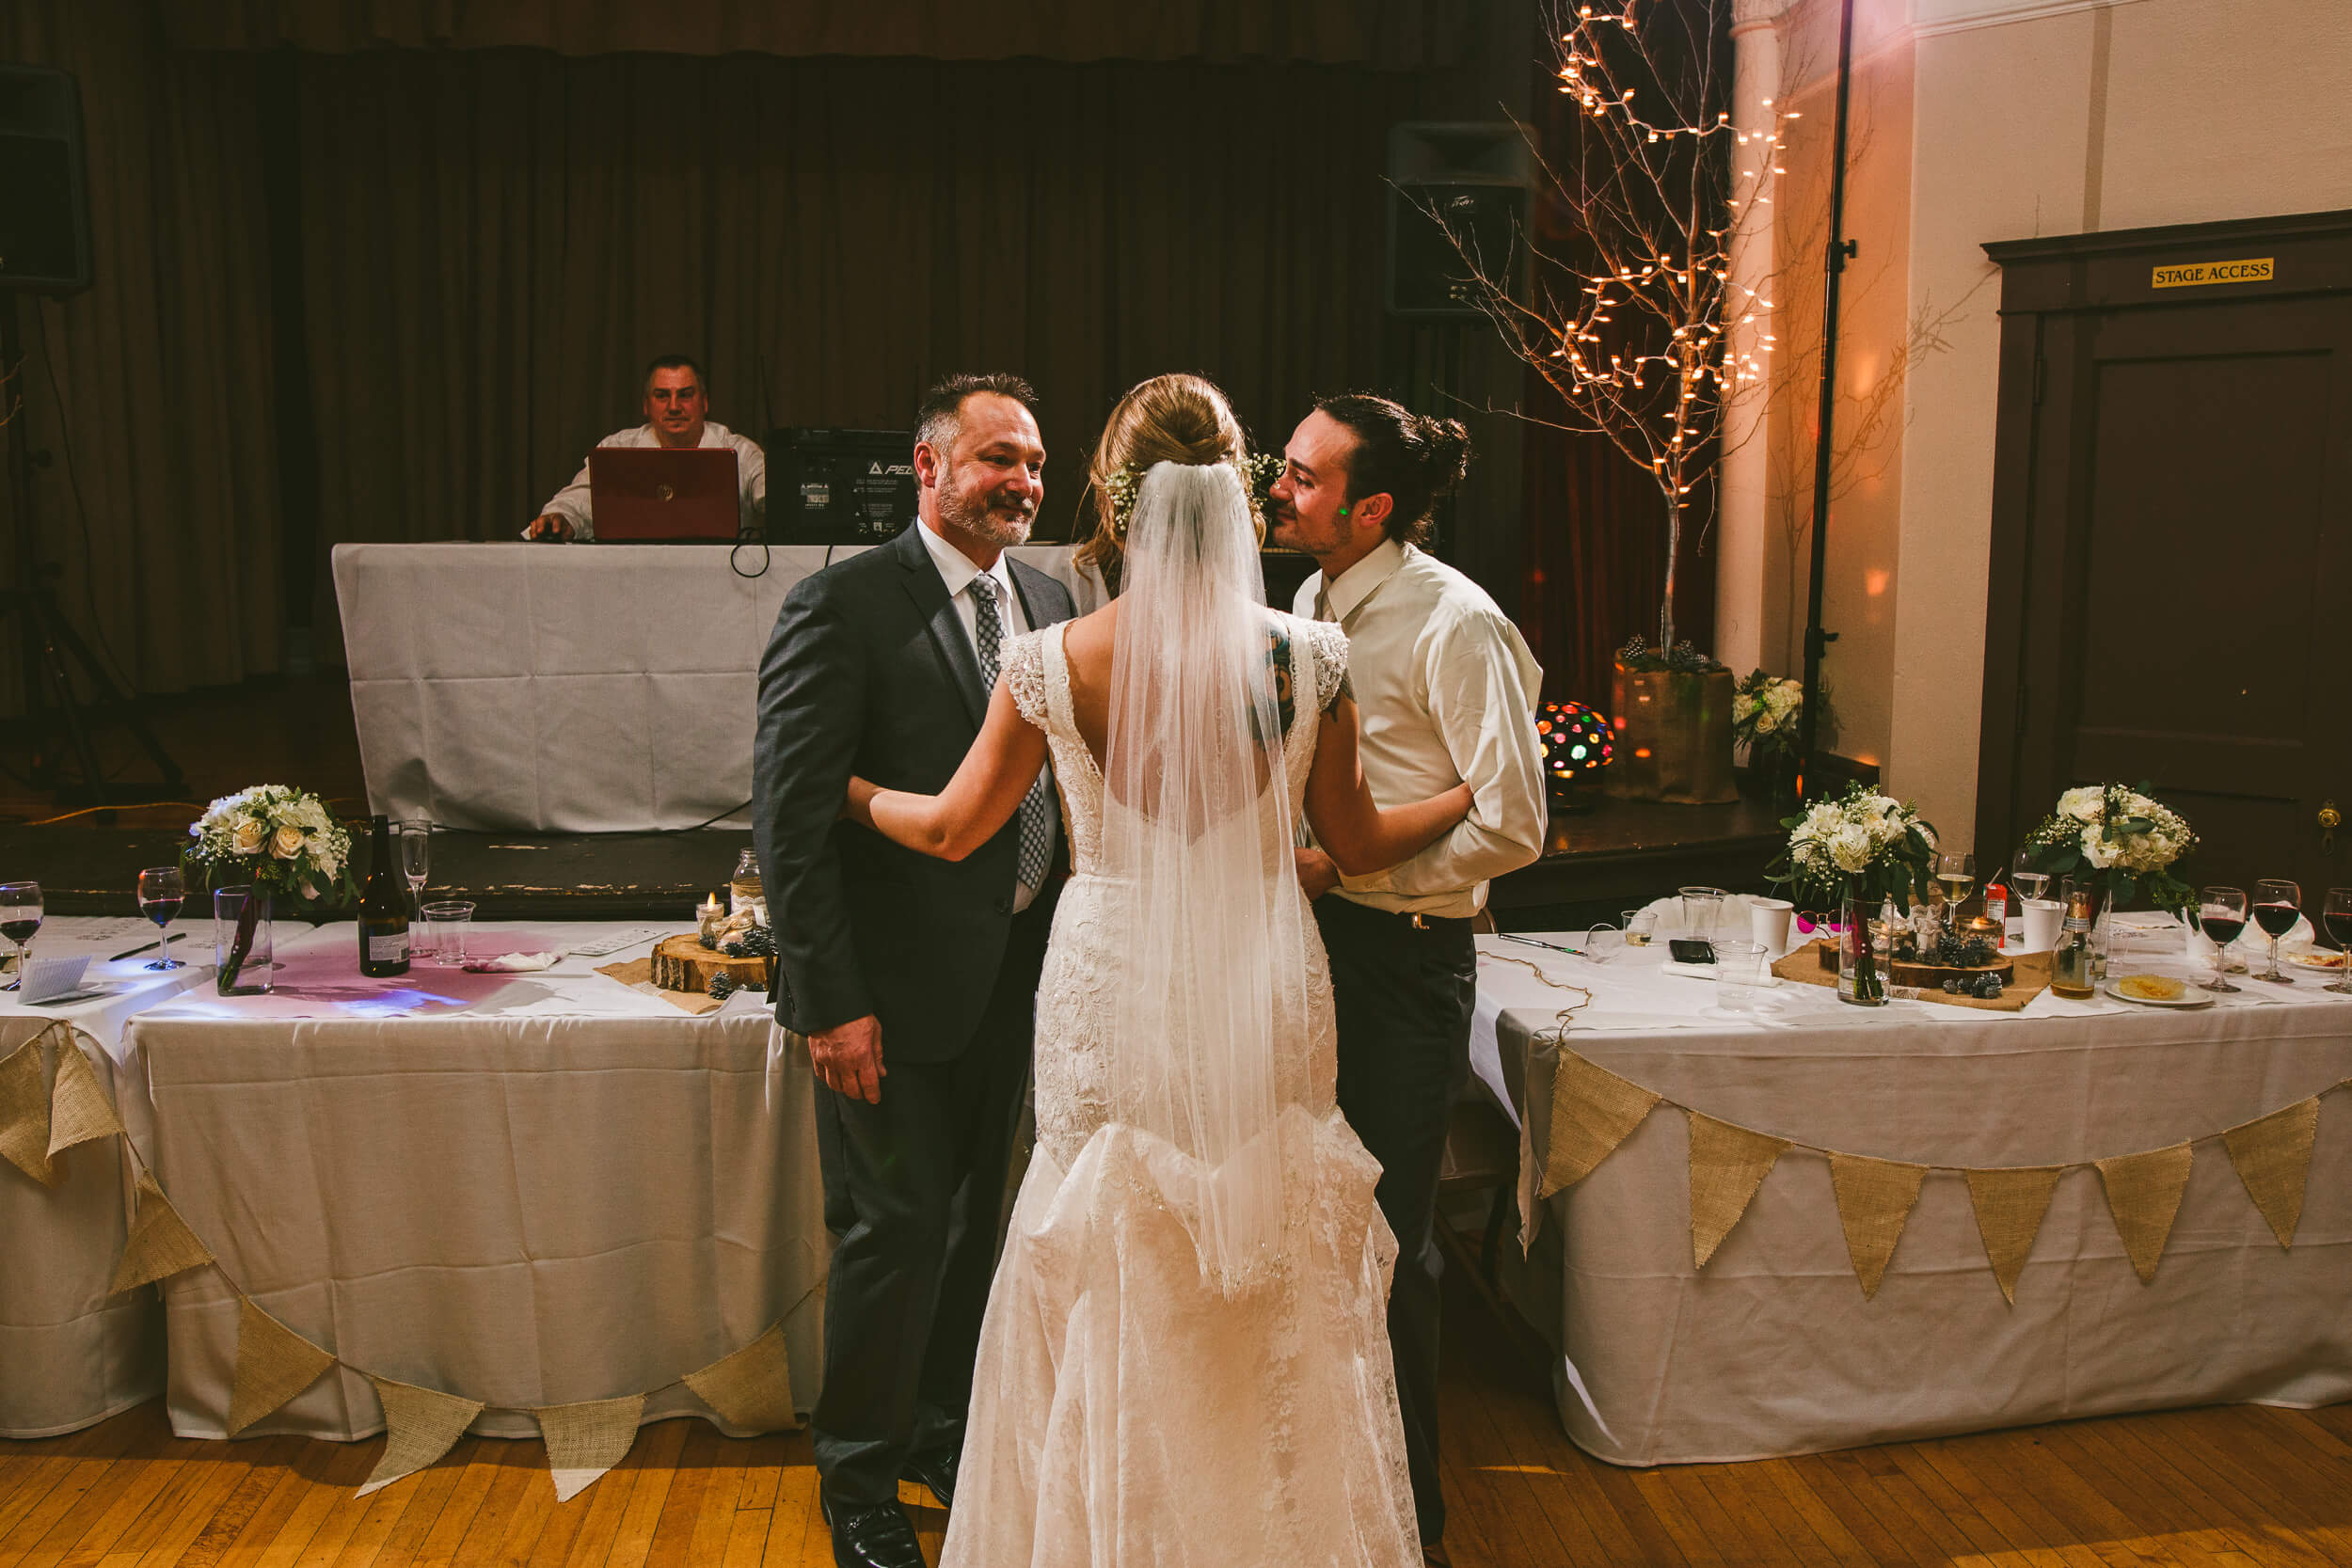 mukogawa winter wedding in spokane (352).jpg